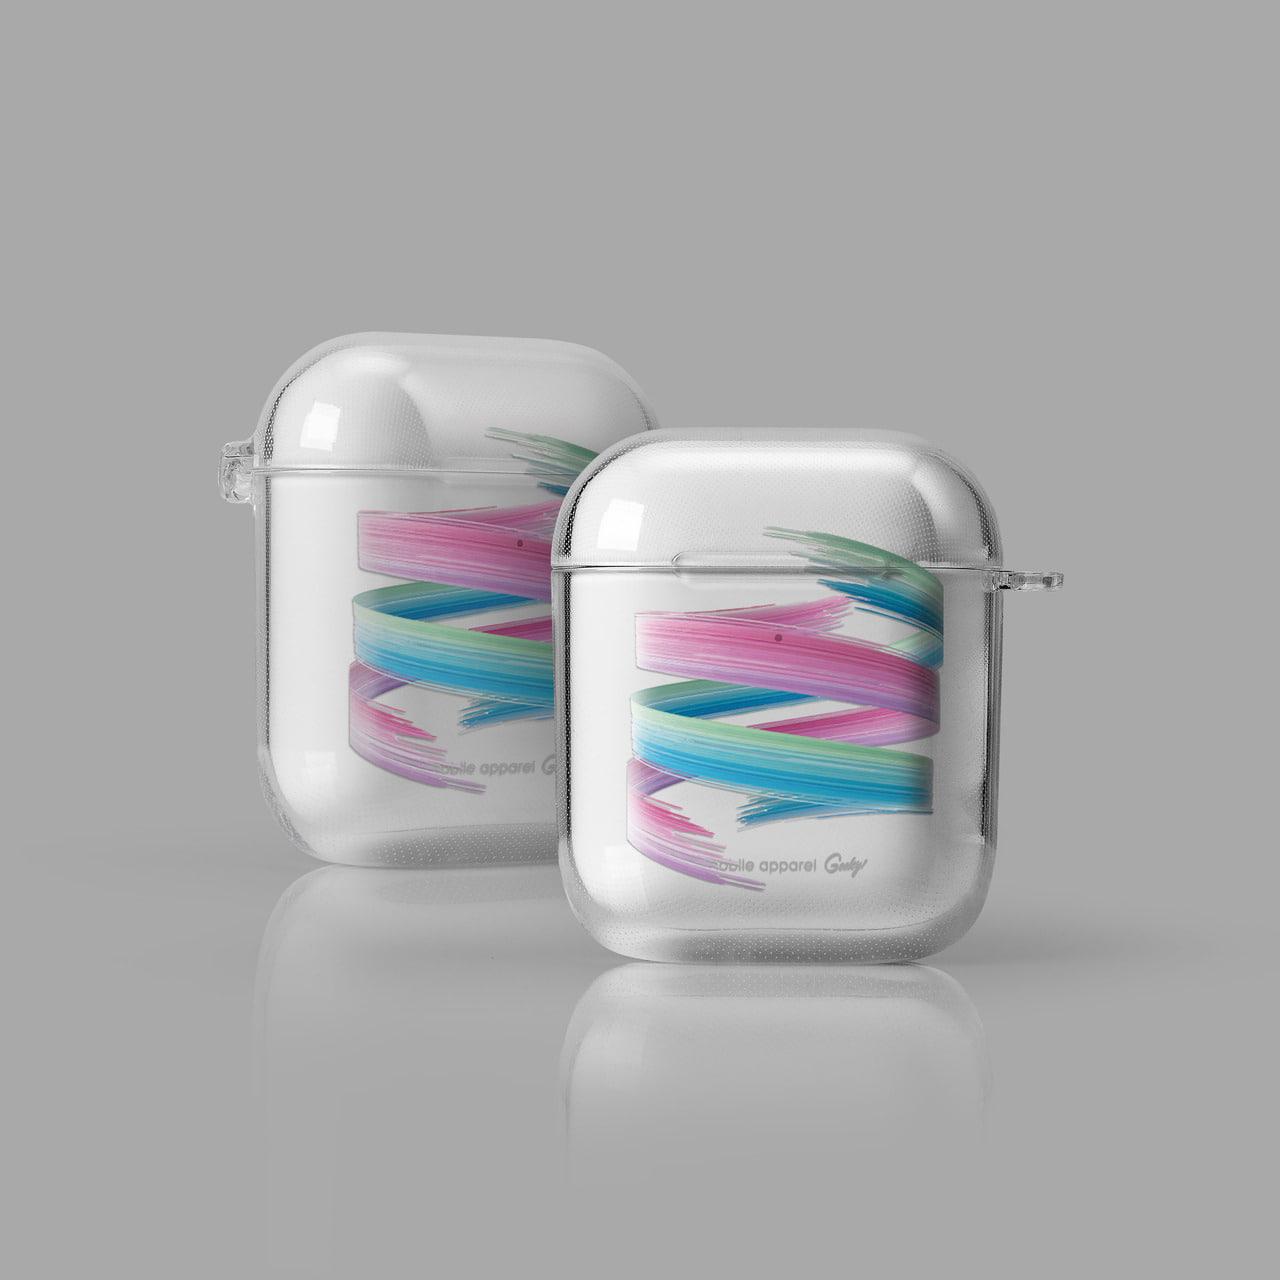 [Airpods cases] Simplicity No.02